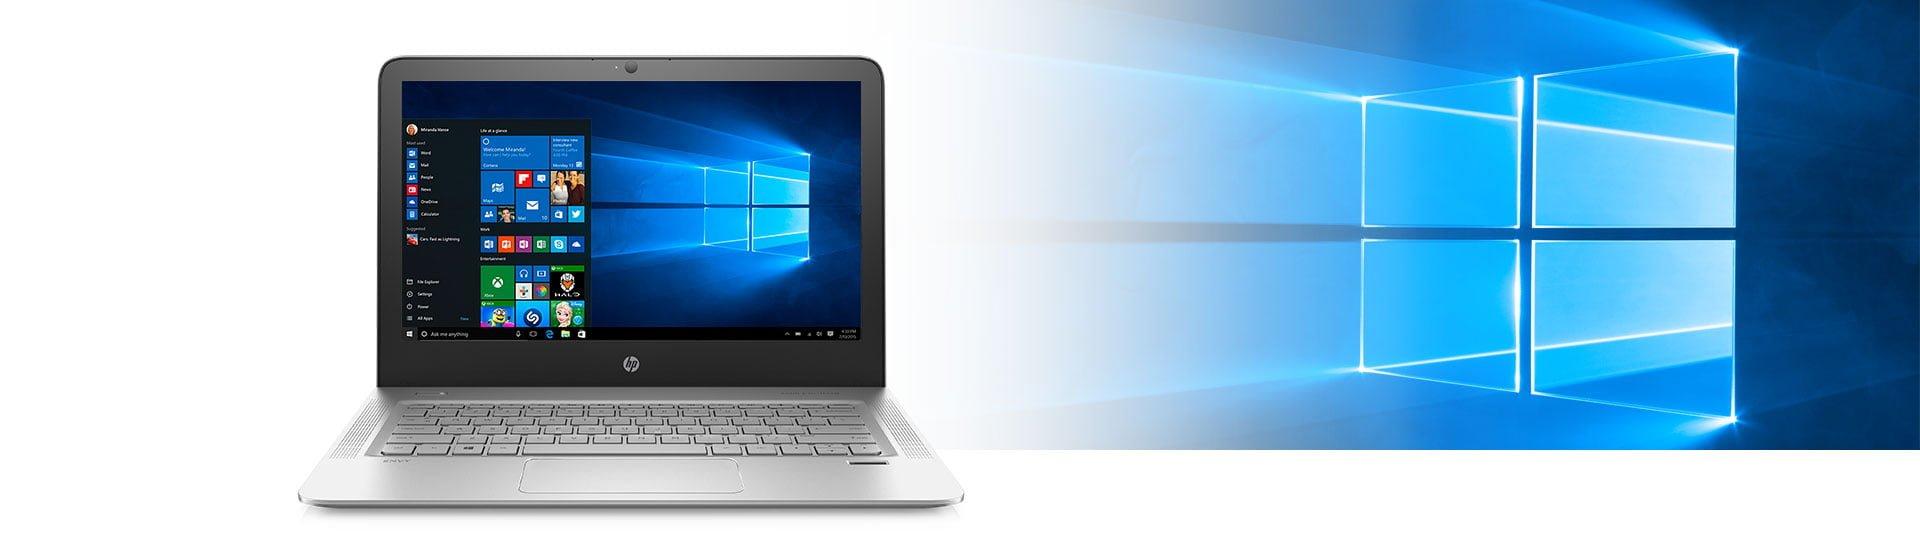 HP Envy 13 Skylake 2015 Windows 10